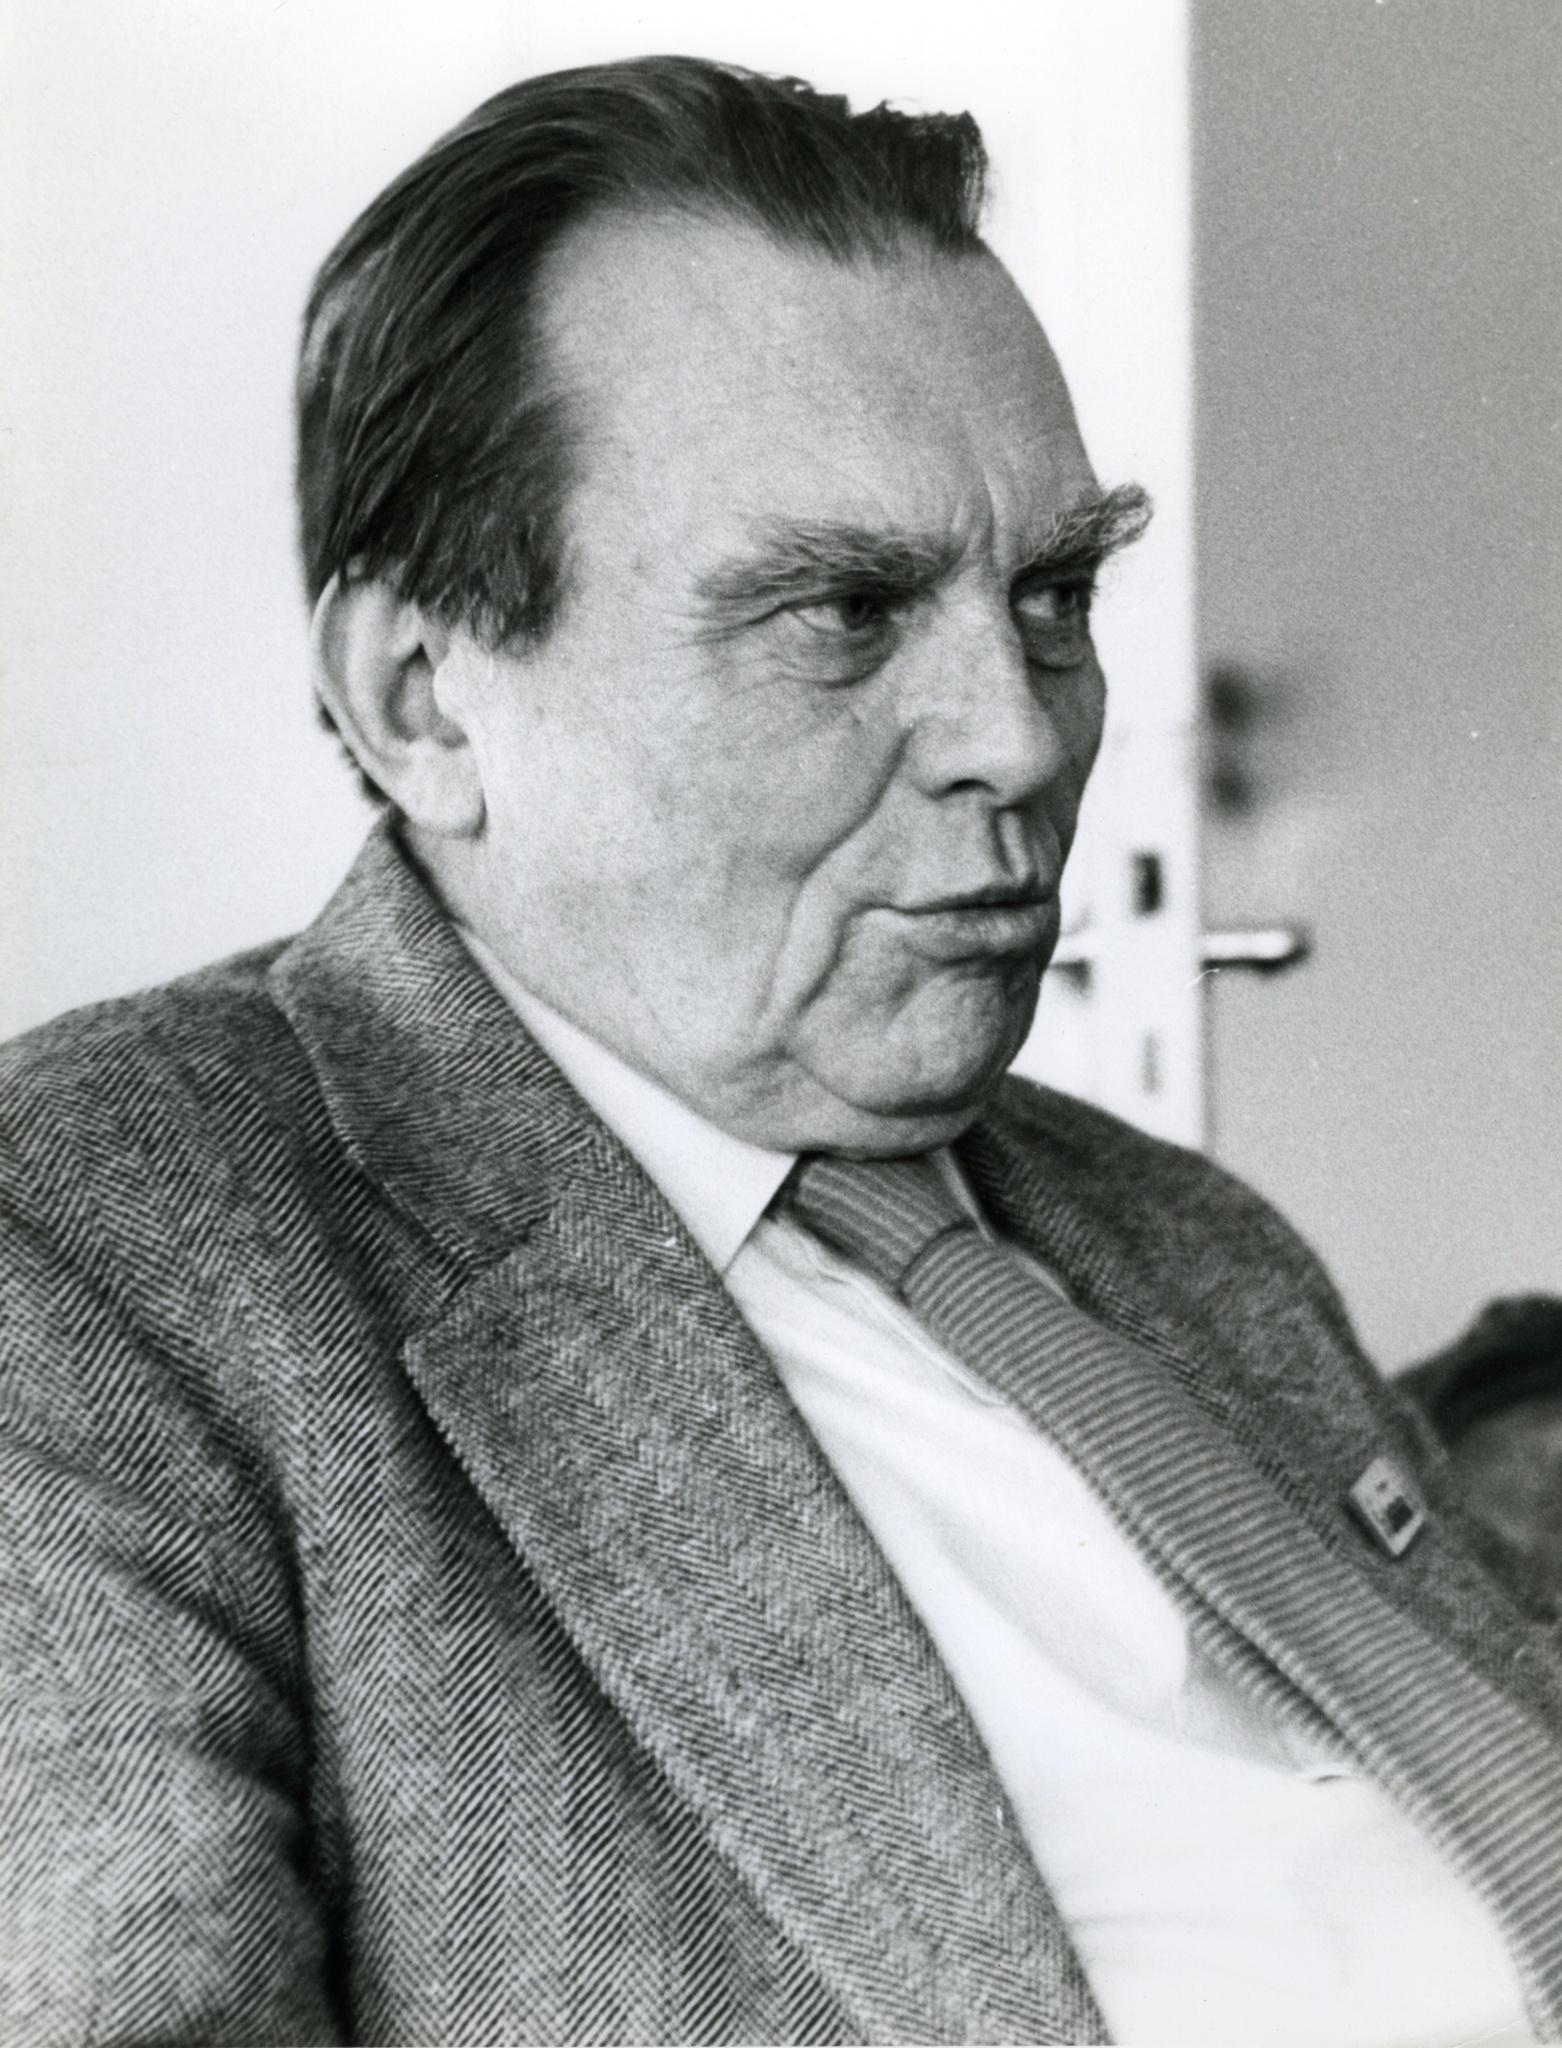 <div class='inner-box'><div class='close-desc'></div><span class='opis'>Czesław Miłosz ze znaczkiem &quot;Solidarności&quot; w klapie. Sztokholm, 1980</span><div class='clearfix'></div><span>Sygn. FIL00855</span><div class='clearfix'></div><span class='autor'>fot. Tomasz Abramowicz</span><div class='clearfix'></div><span>&copy;Tomasz Abramowicz</span></div>